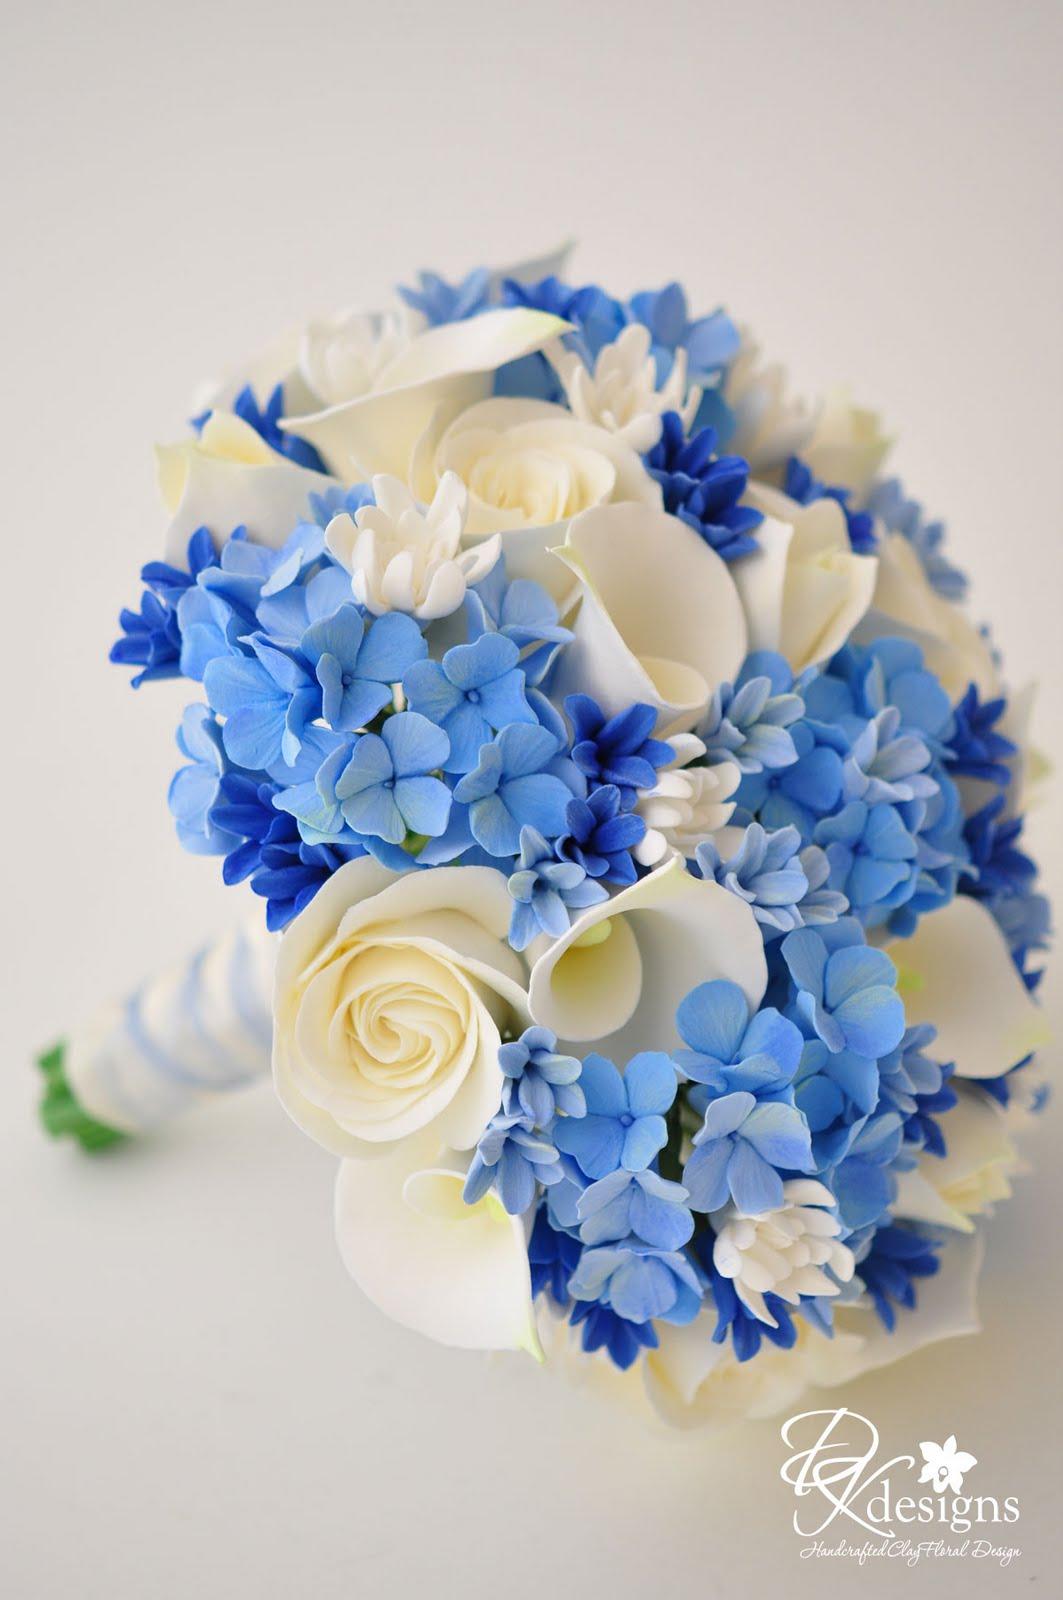 best wedding ideas lovely navy blue wedding centerpieces theme. Black Bedroom Furniture Sets. Home Design Ideas